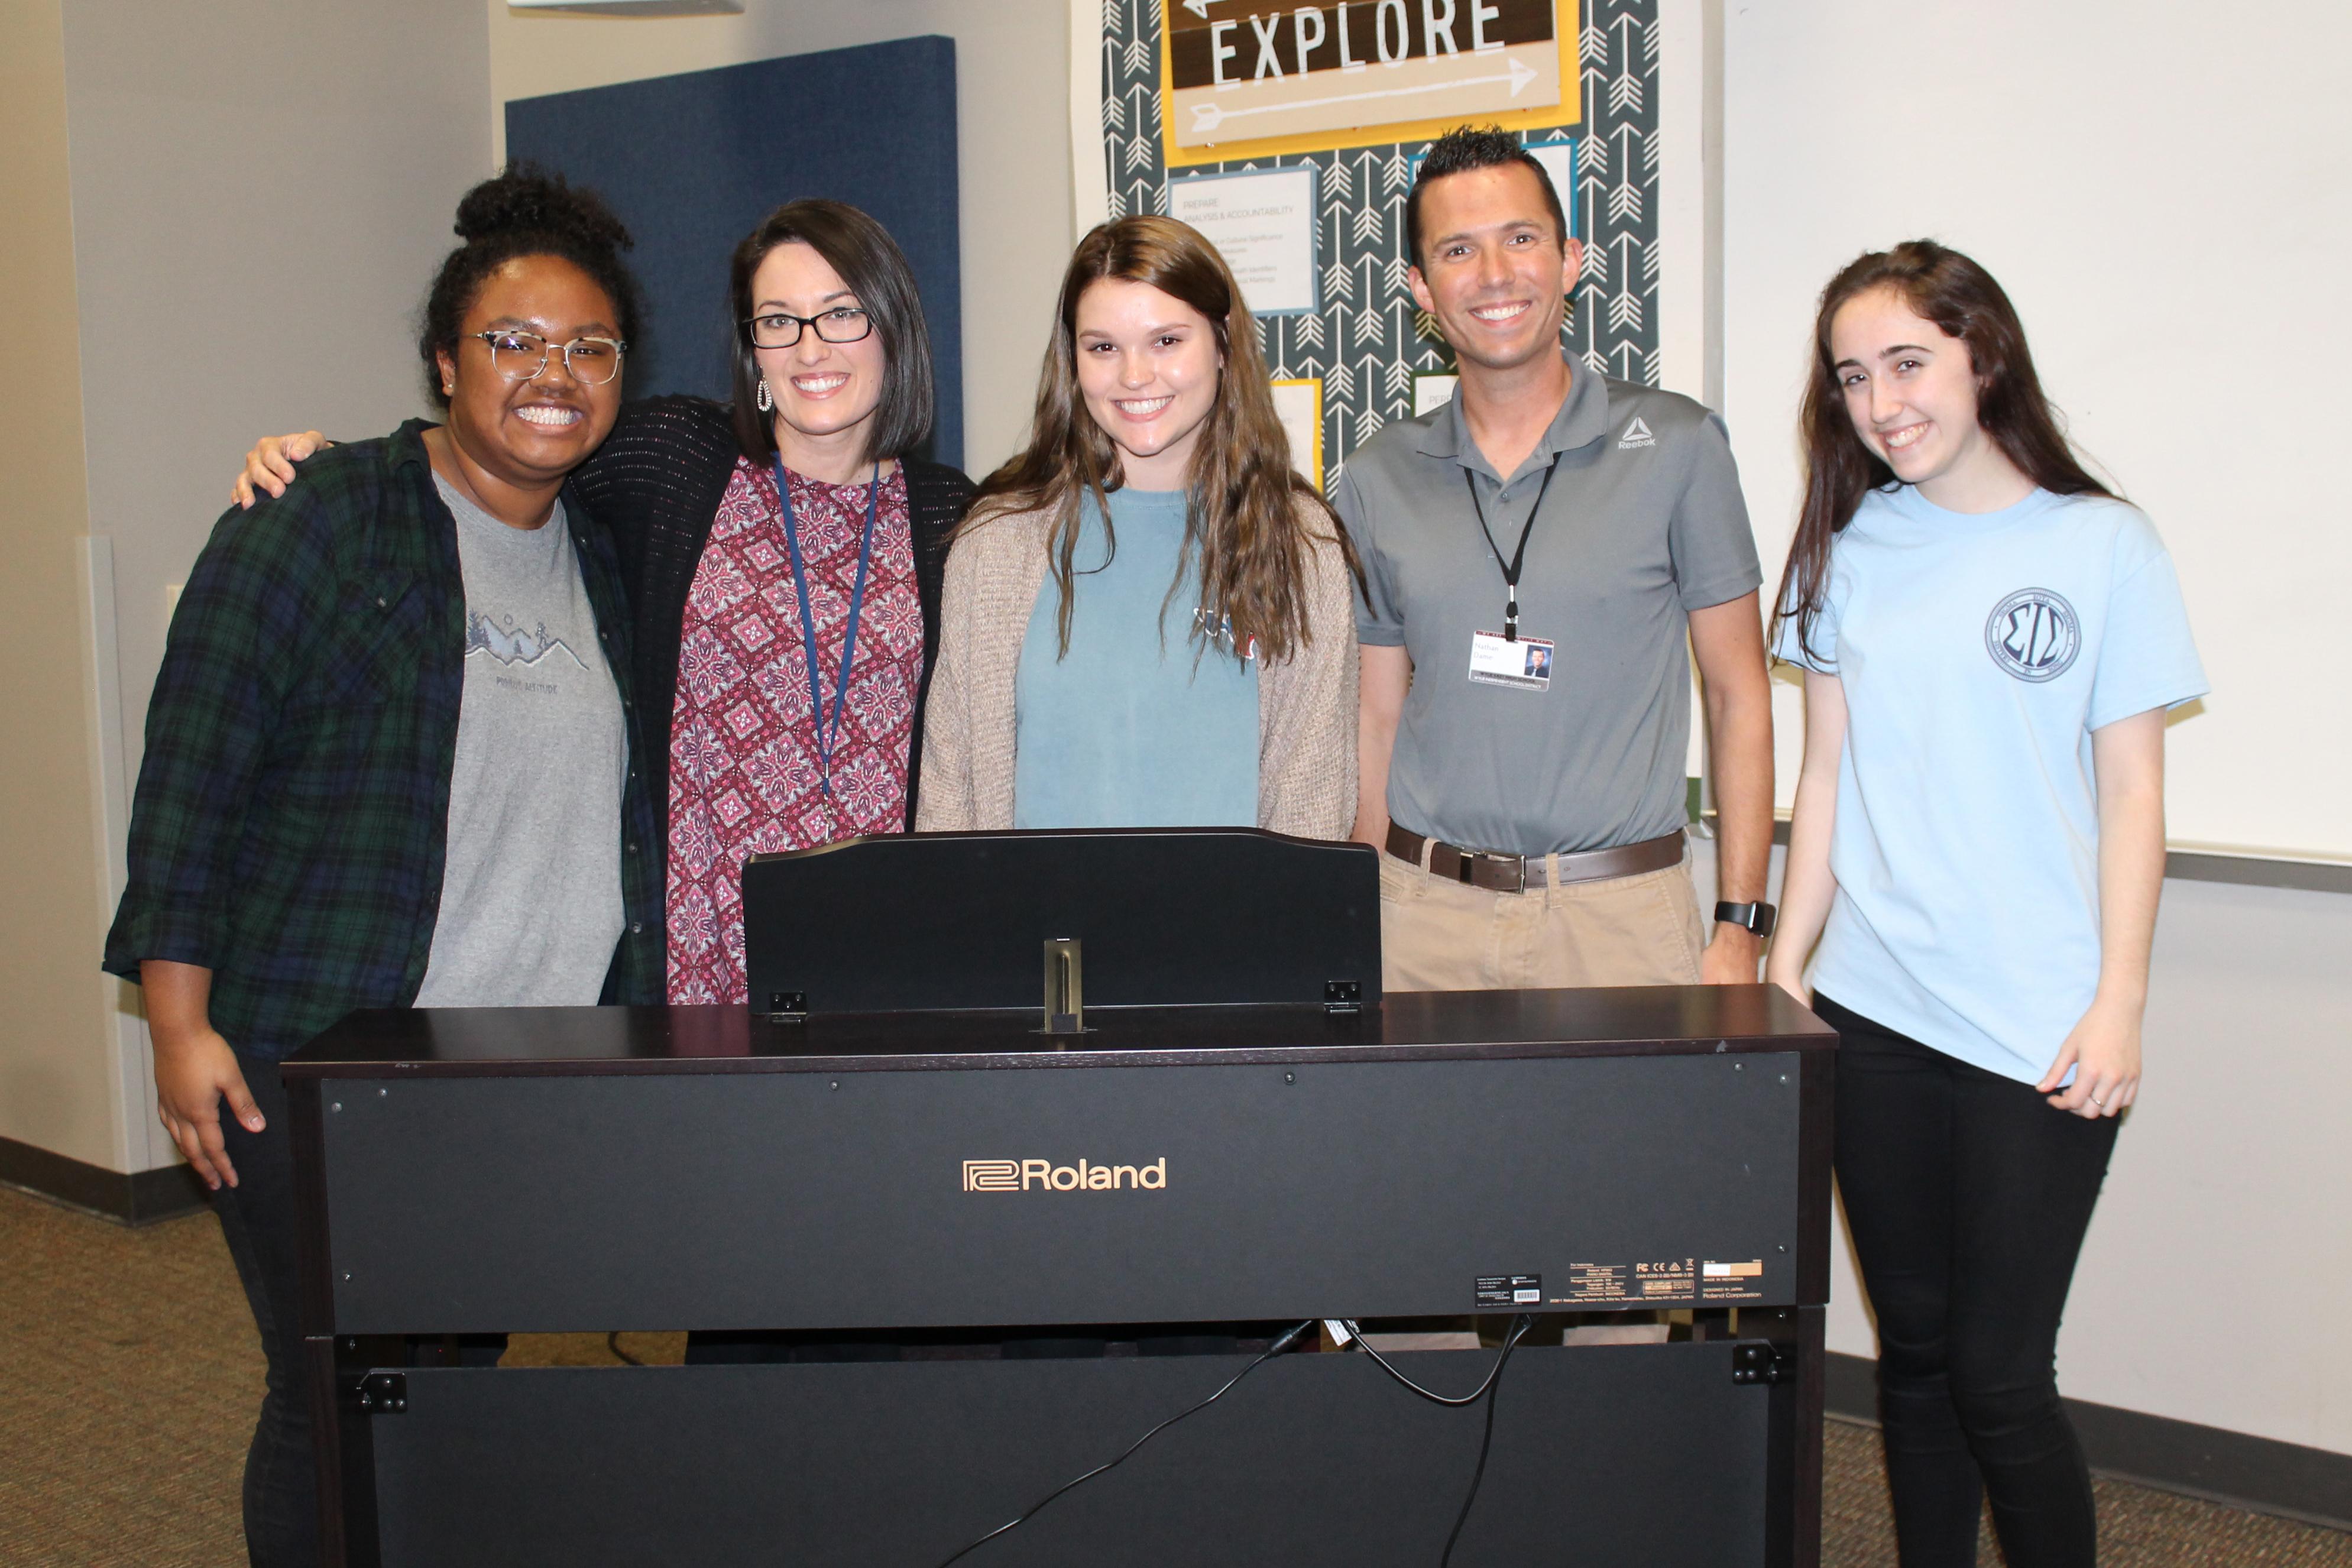 Choir program teaches more than music to students